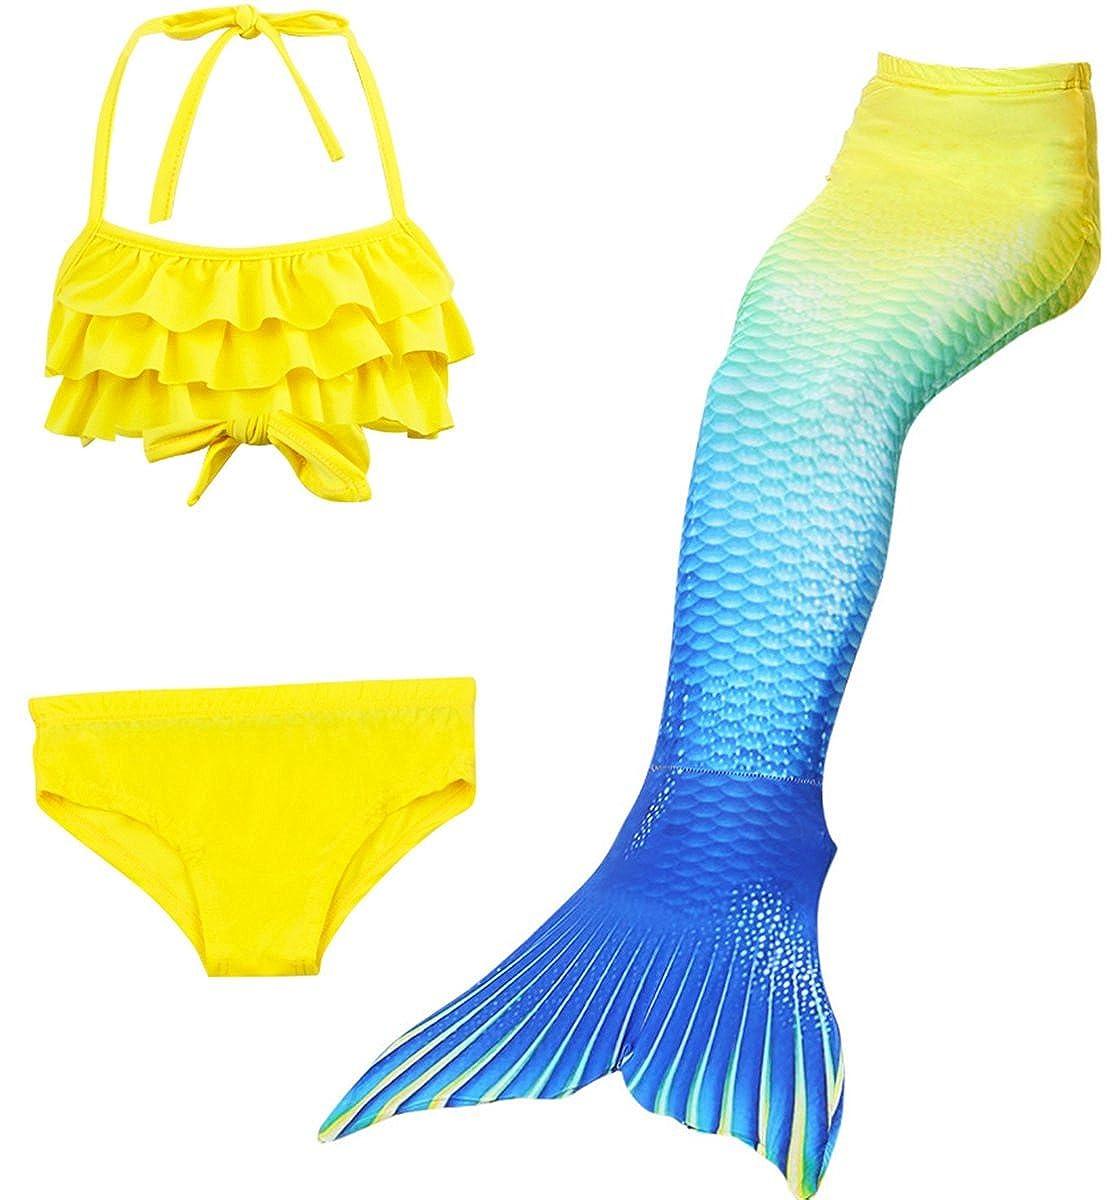 LCXYYY Mädchen Meerjungfrauen Tankini Bikini Set Schwimmanzug Badeanzüge Prinzessin Cosplay Kostüm Neckholder Falt Tops Meerjungfrauenschwanz Schwimmen Meerjungfrauenflosse für Kinder Bademode 3pcs